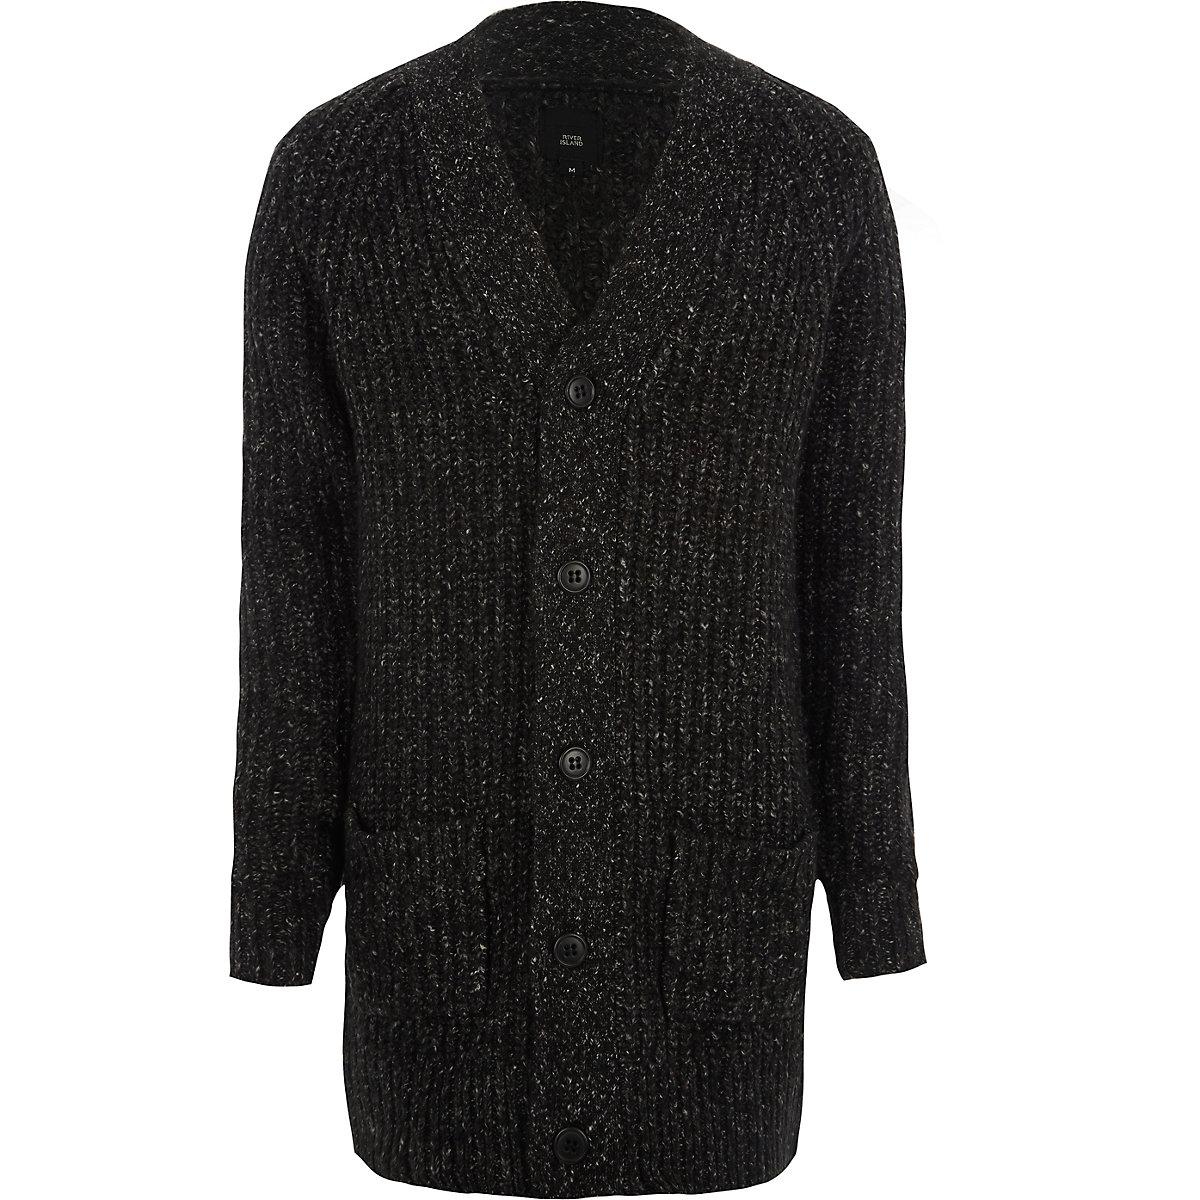 Black long sleeve longline knit cardigan